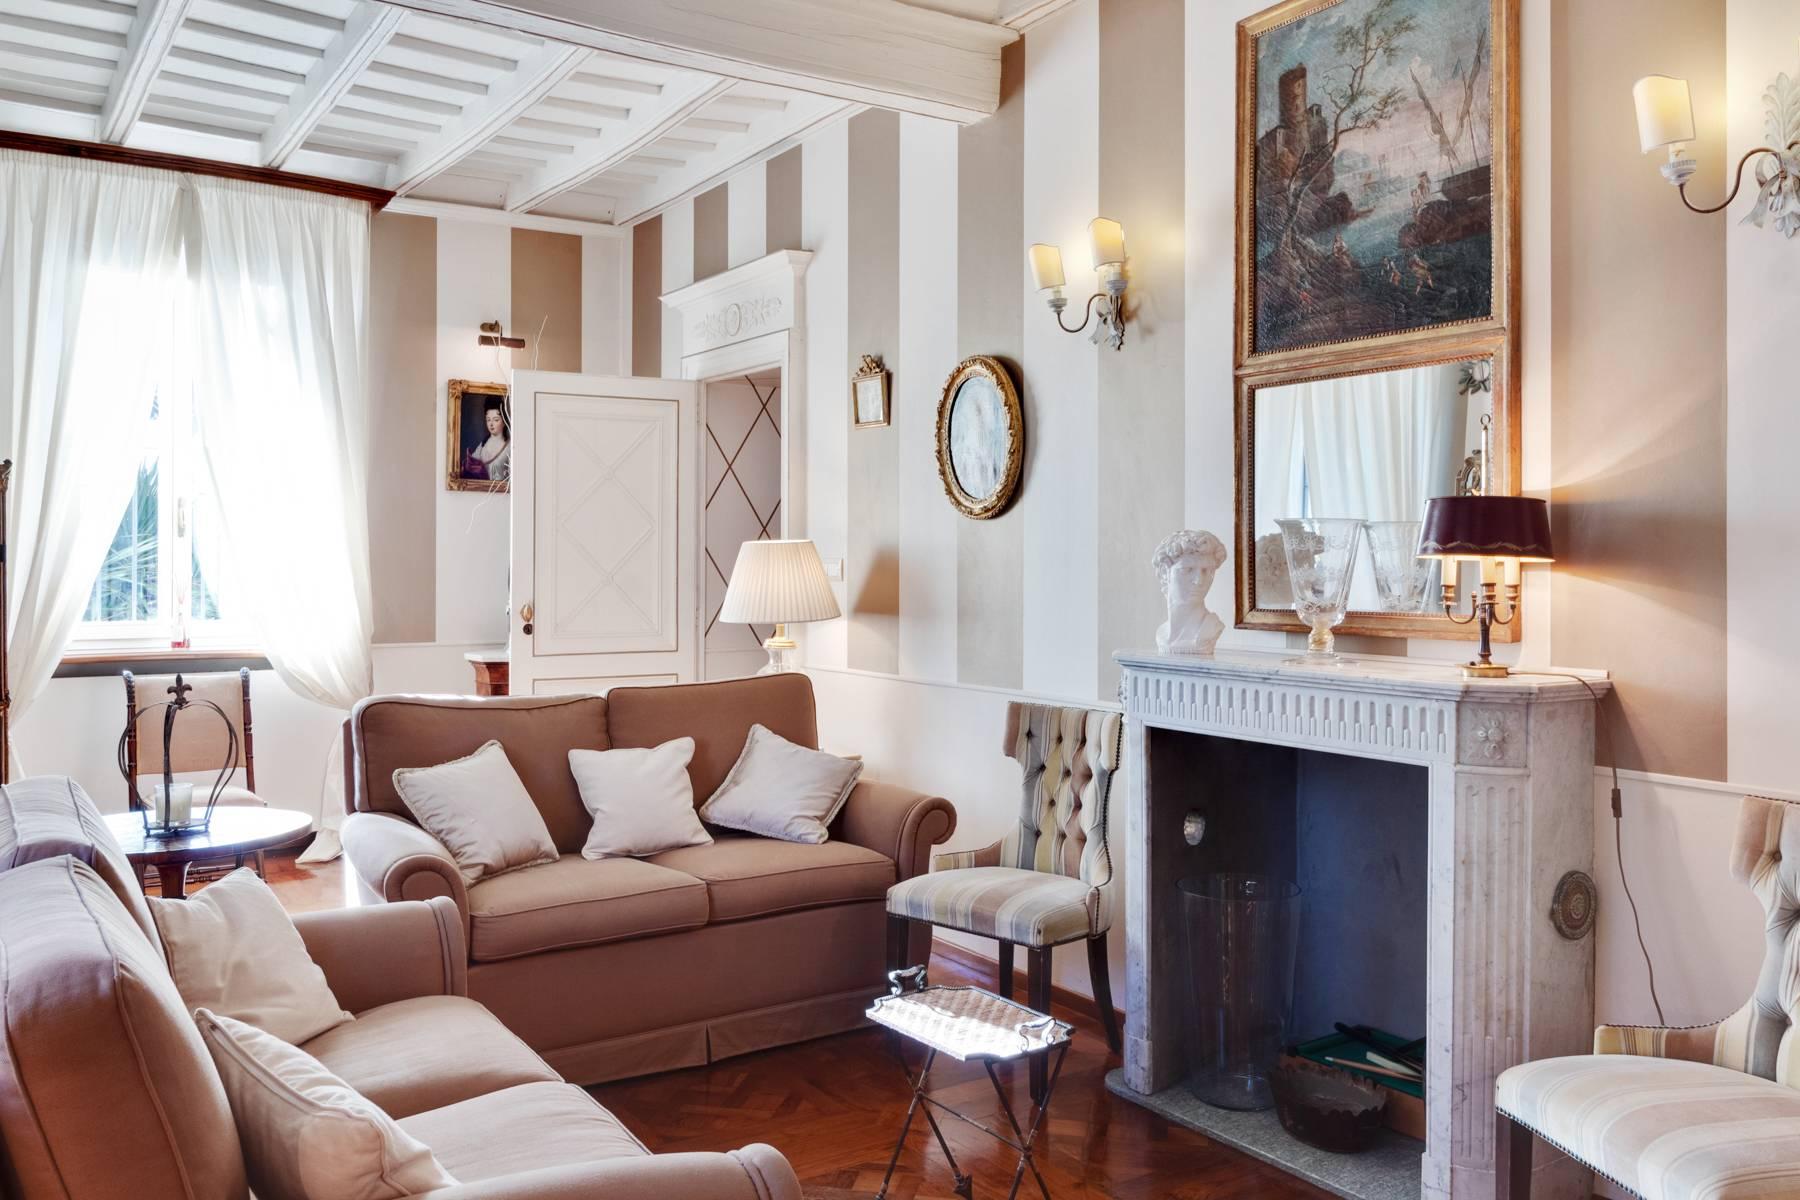 Casa indipendente in Vendita a Torino: 5 locali, 270 mq - Foto 5